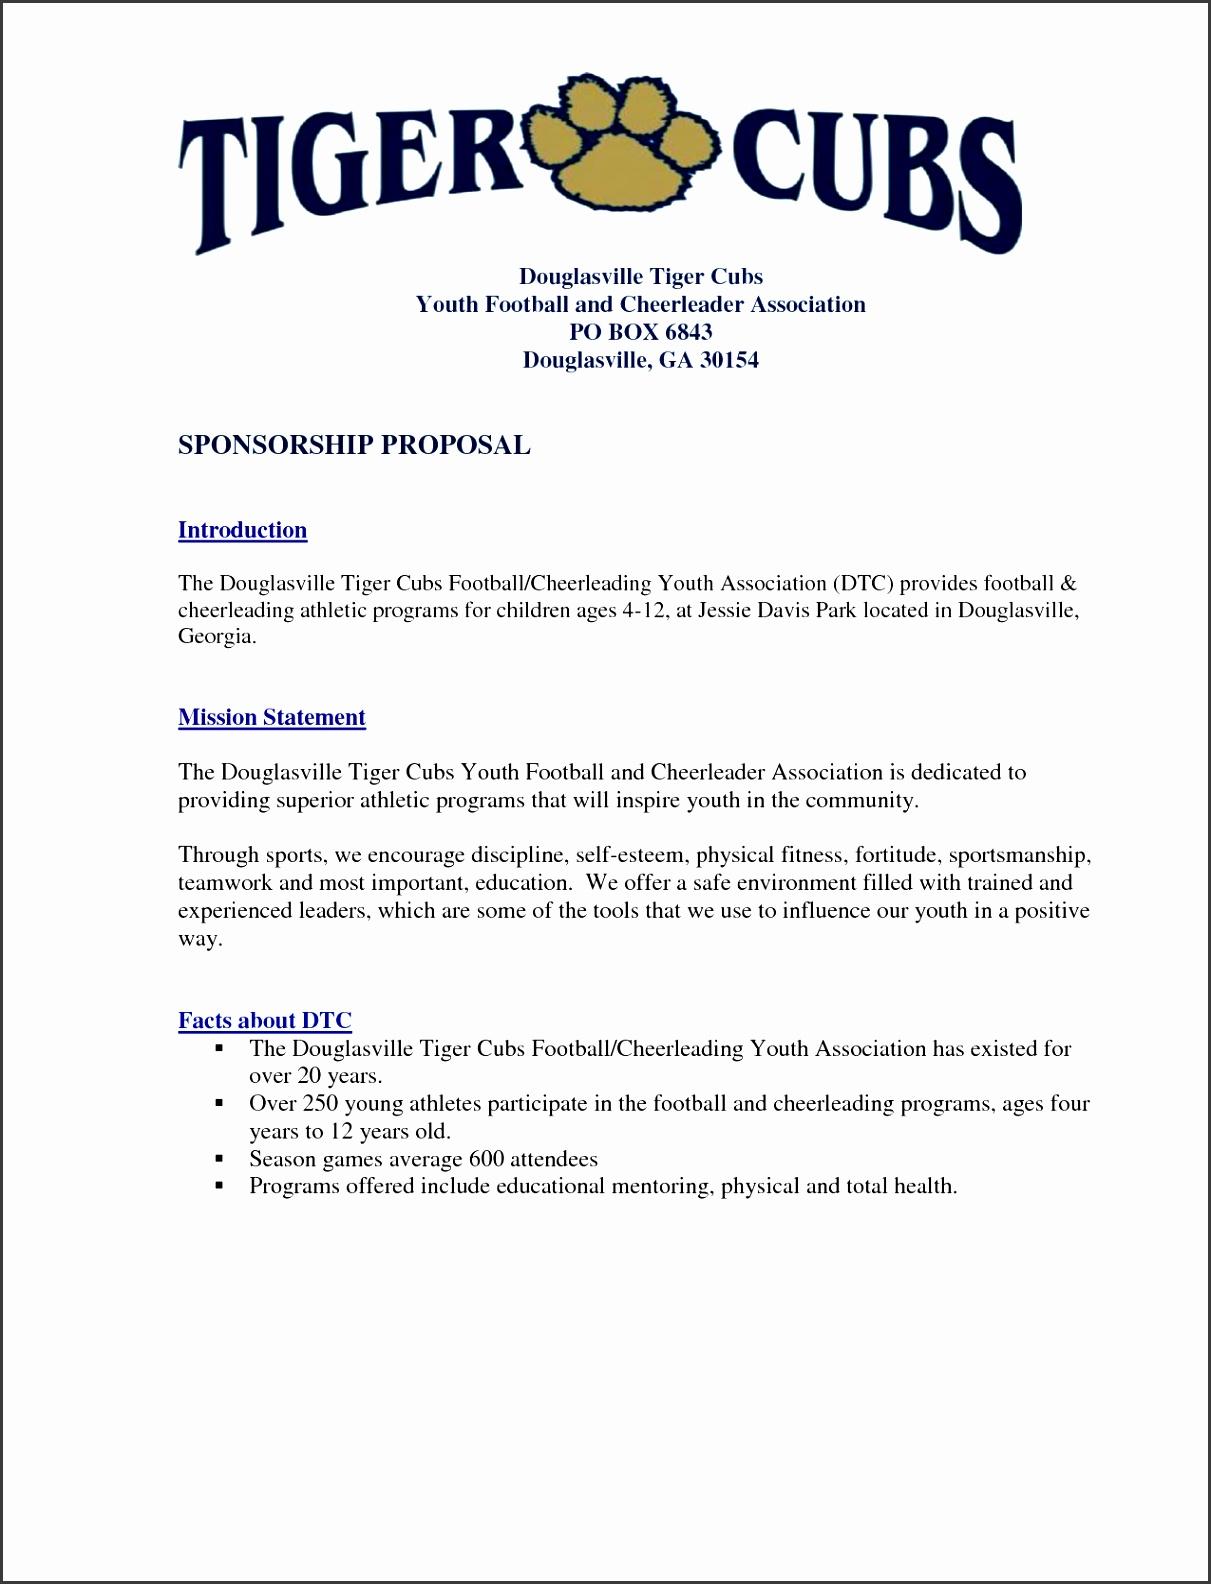 Sports Sponsorship Proposal Lovely Youth Sponsorship Letter 55 Sample Proposal Letter for